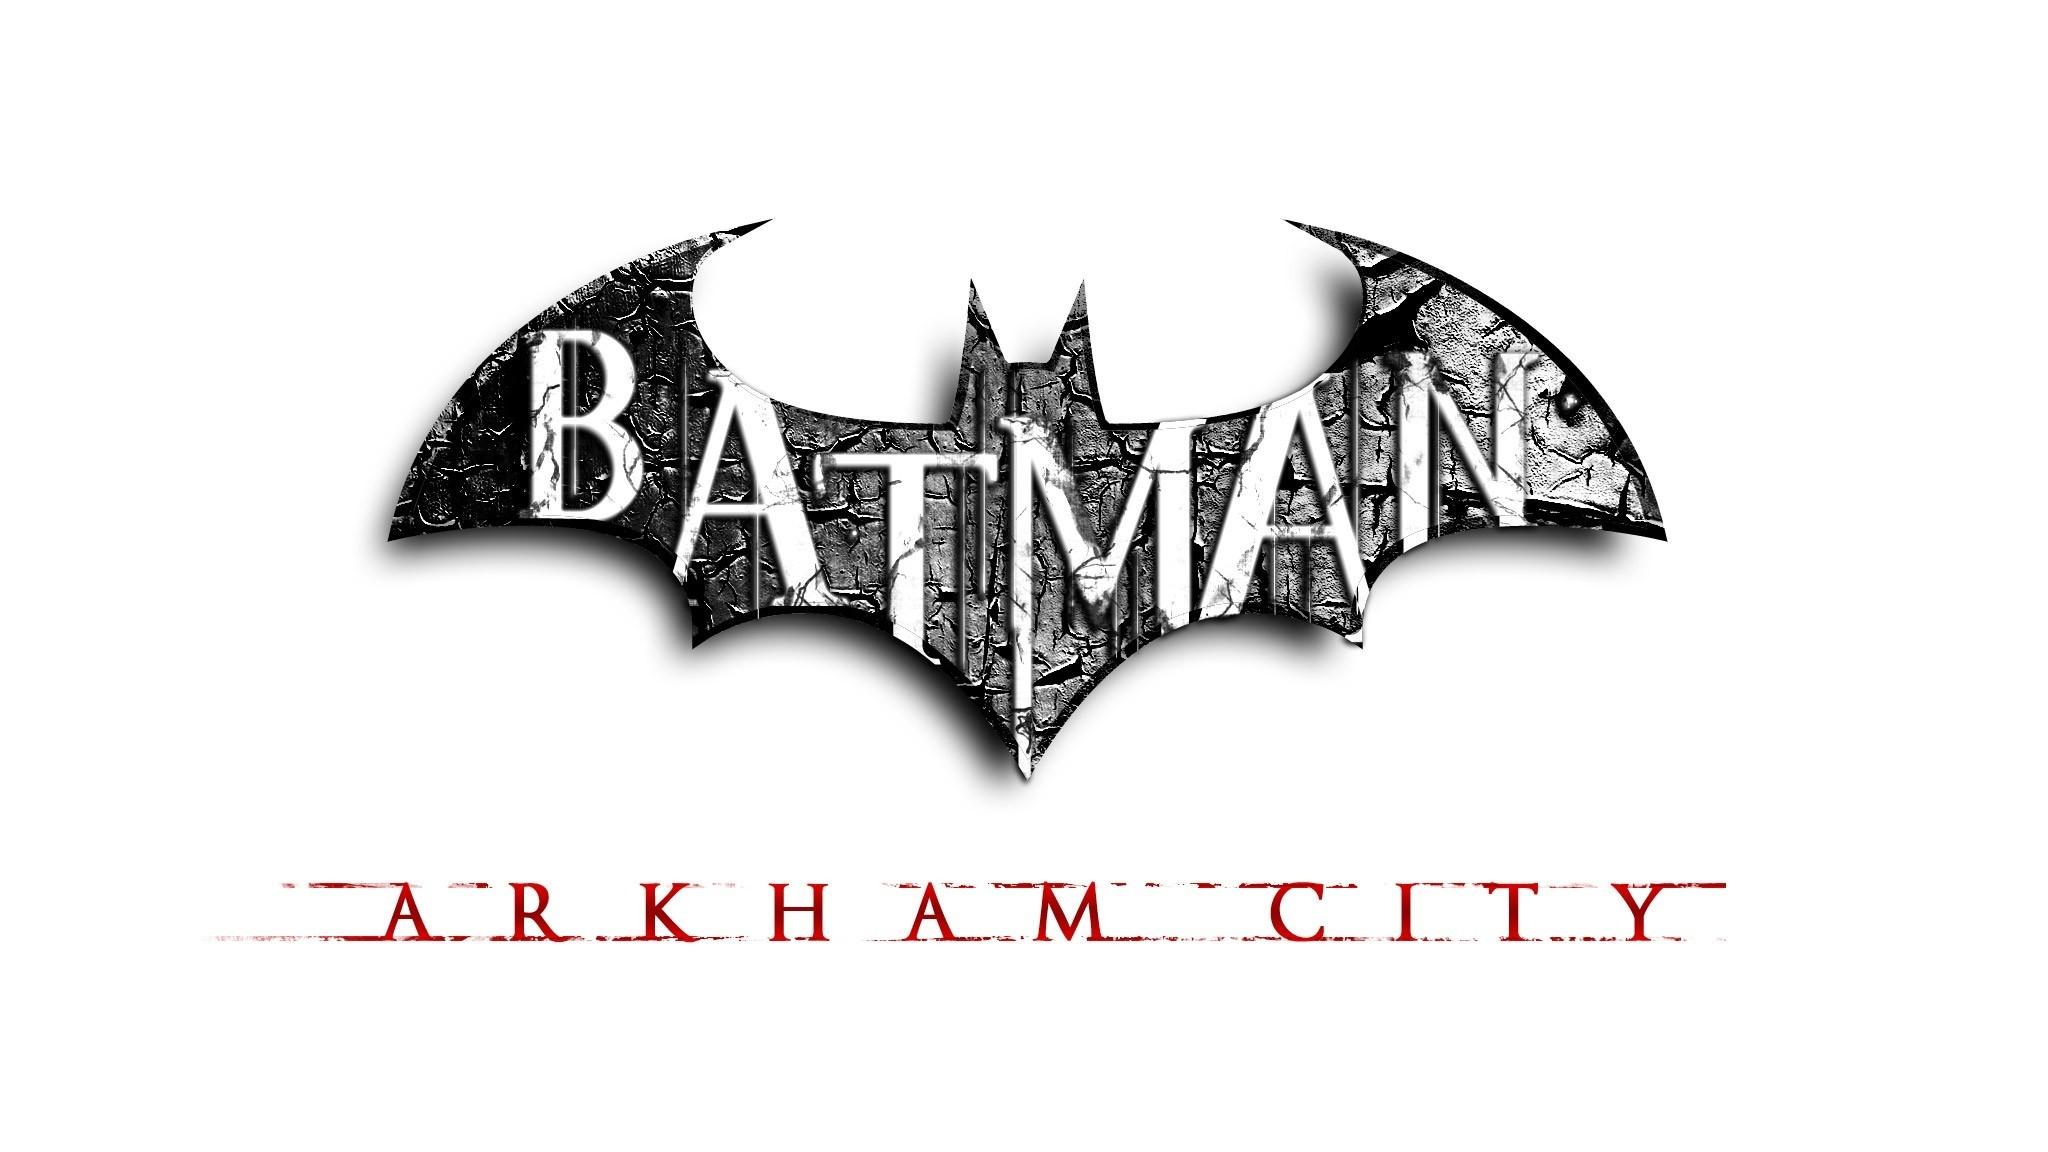 Batman Arkham City Joker Symbol Free Download • Playapk.co